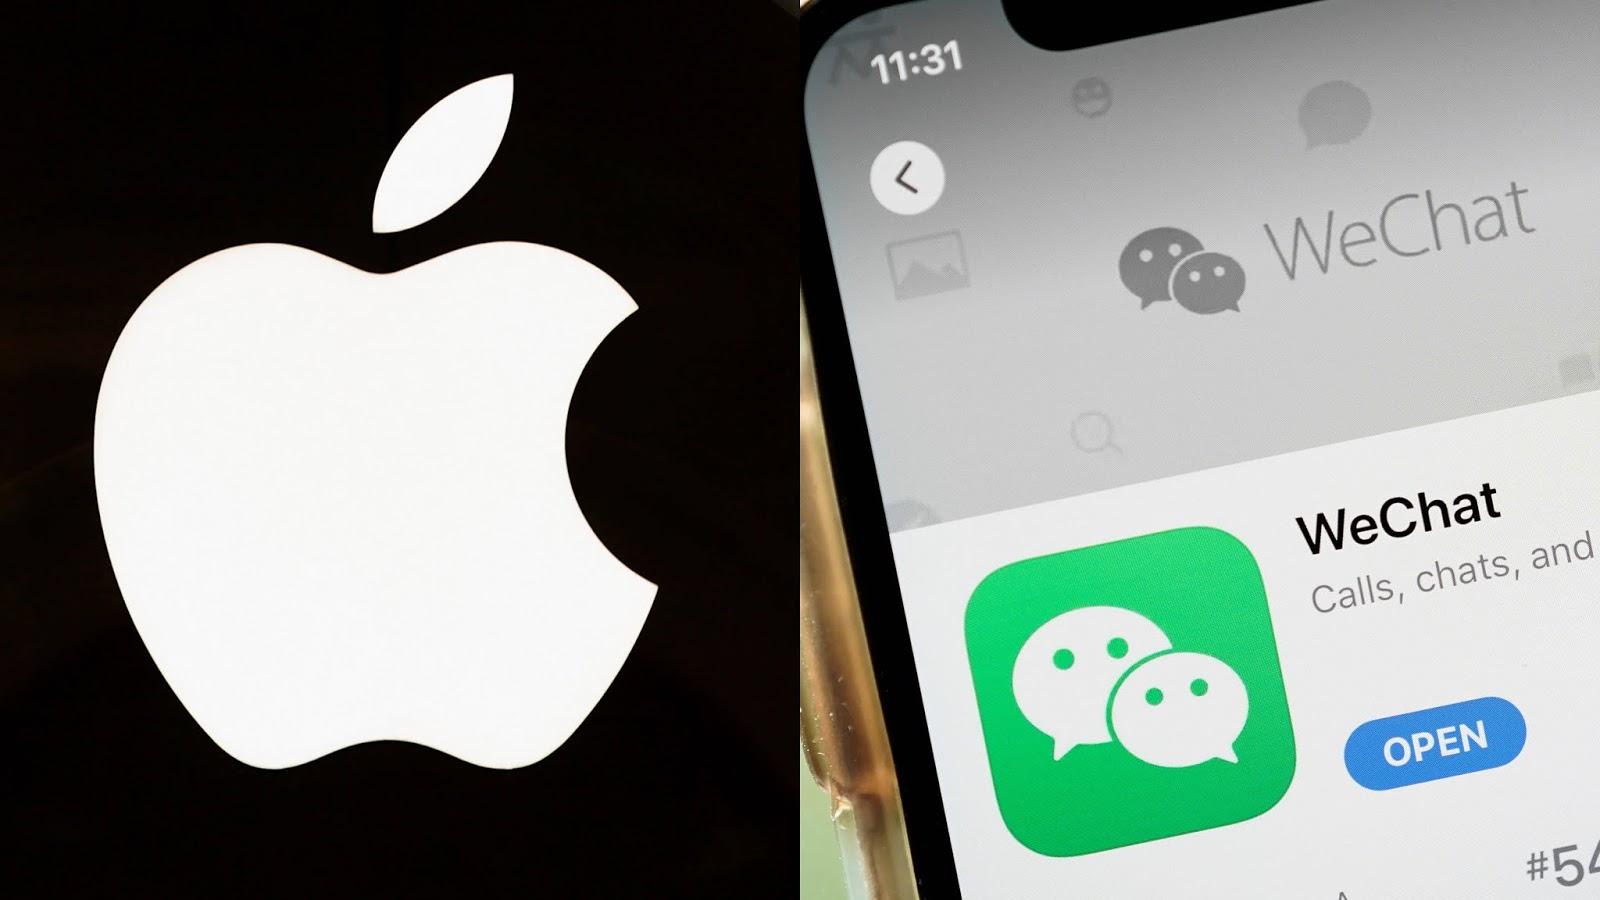 larangan-wechat-dapat-menghentikan-penjualan-iphone